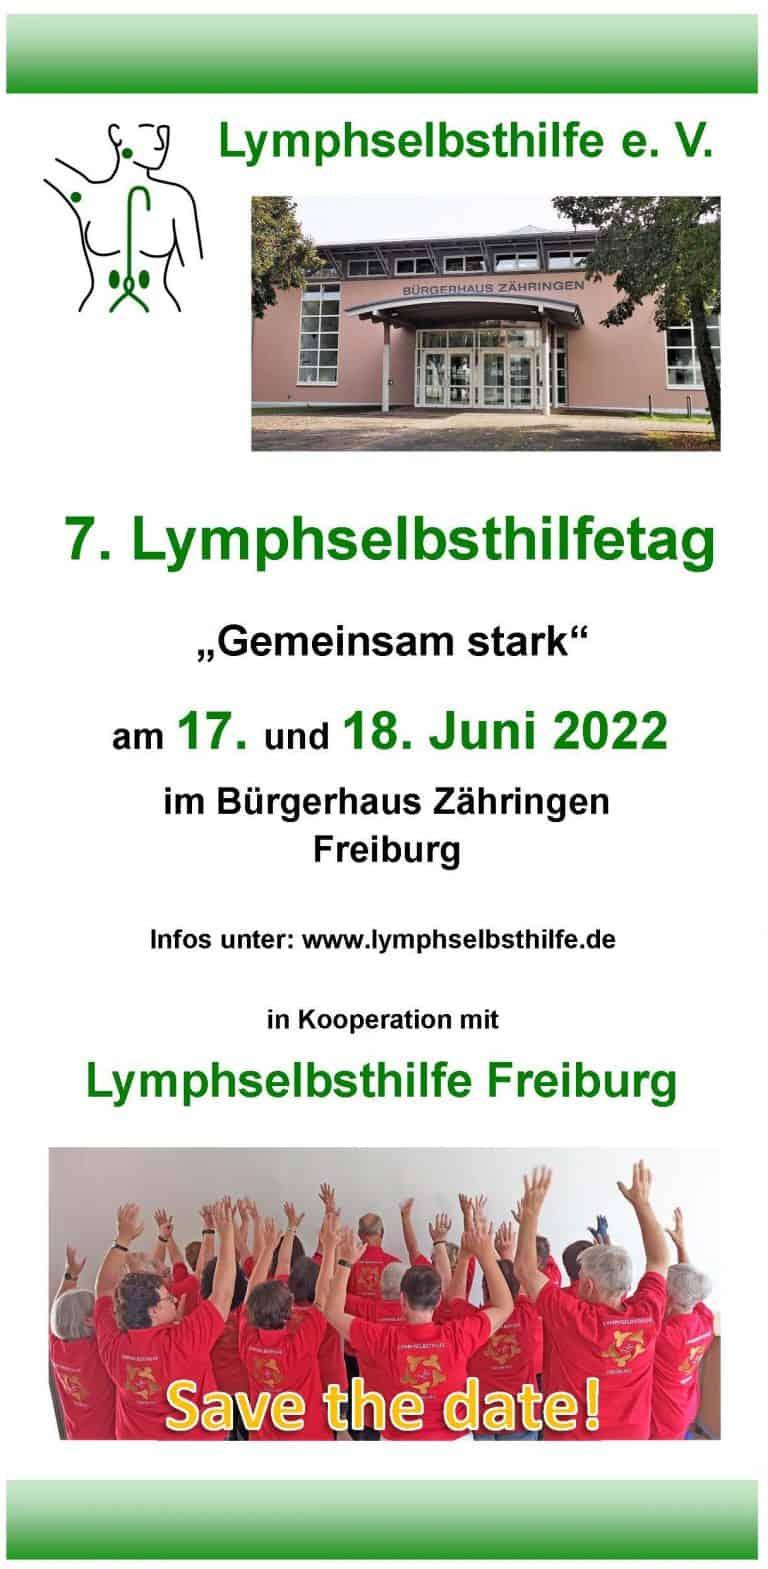 7. LSH-Tag in Freiburg